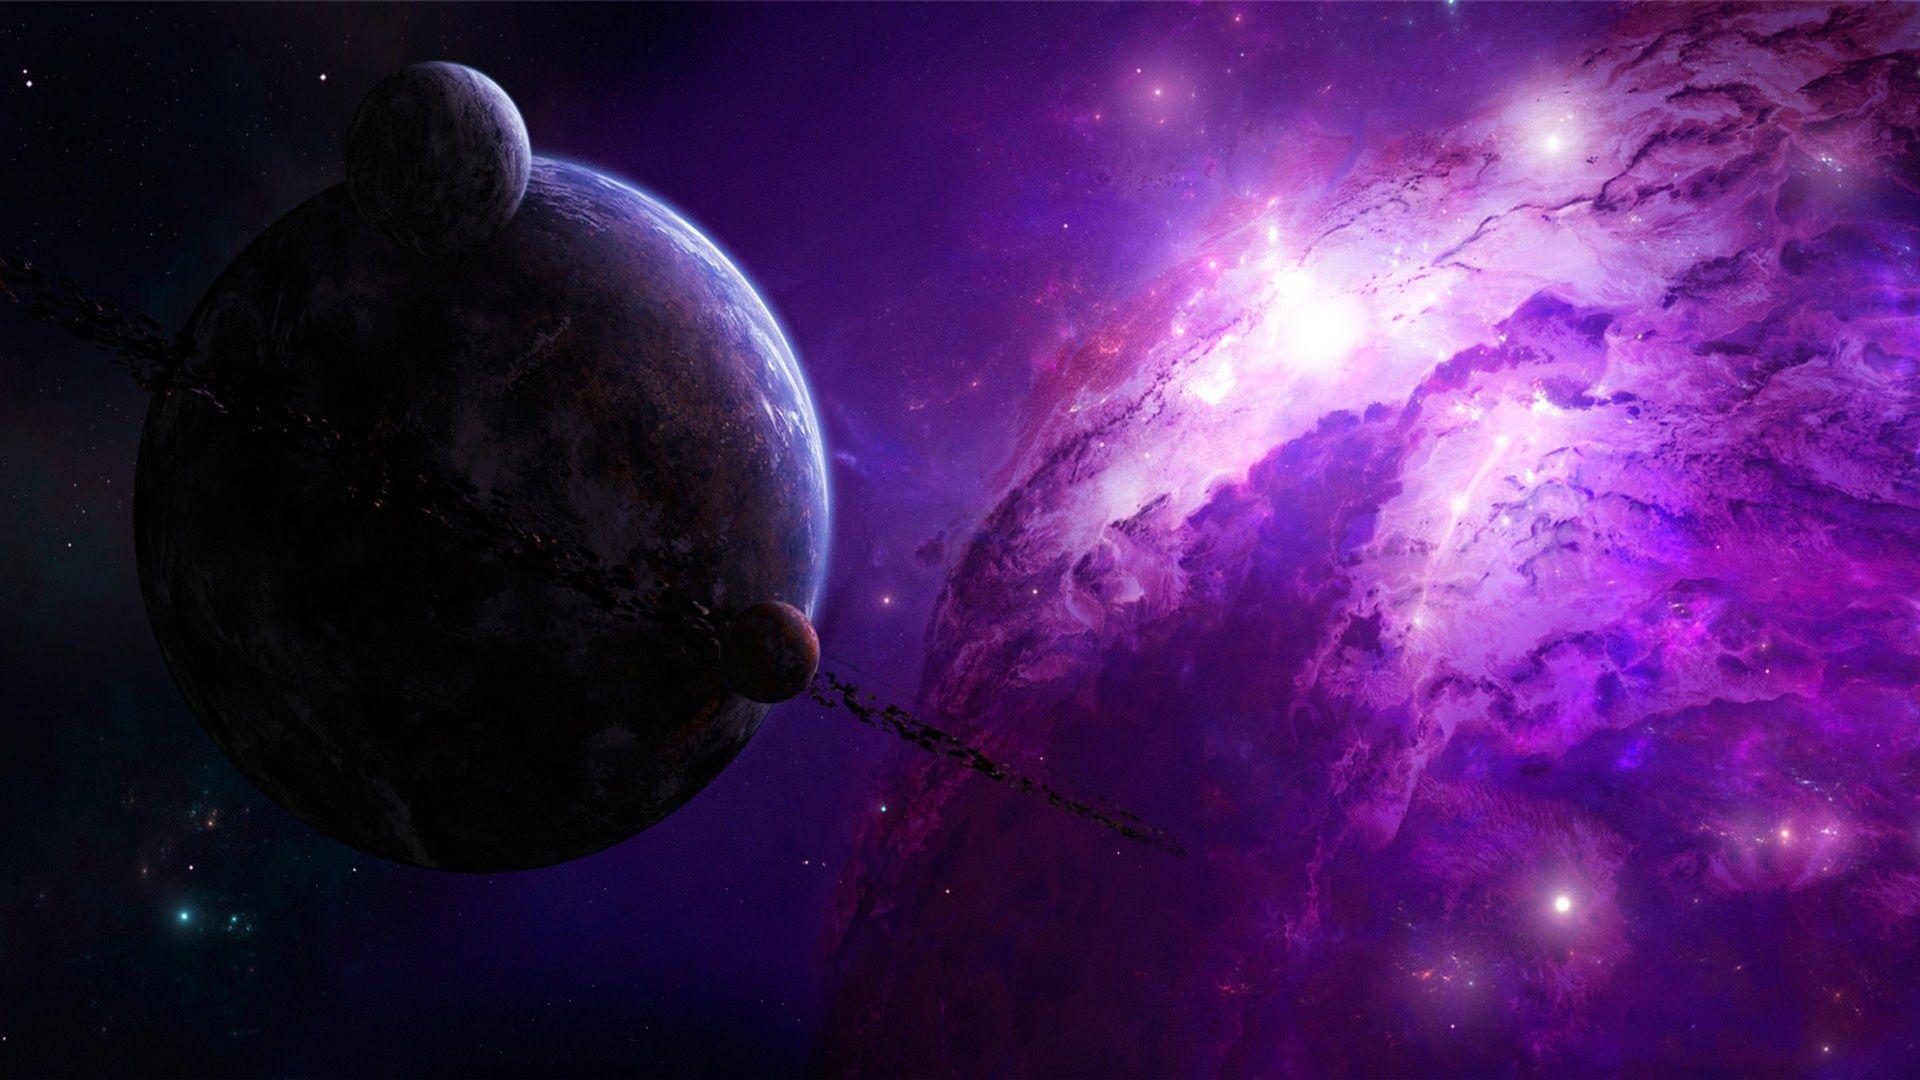 Super Hd Galaxy Wallpapers > - Cool Galaxy Backgrounds Hd , HD Wallpaper & Backgrounds